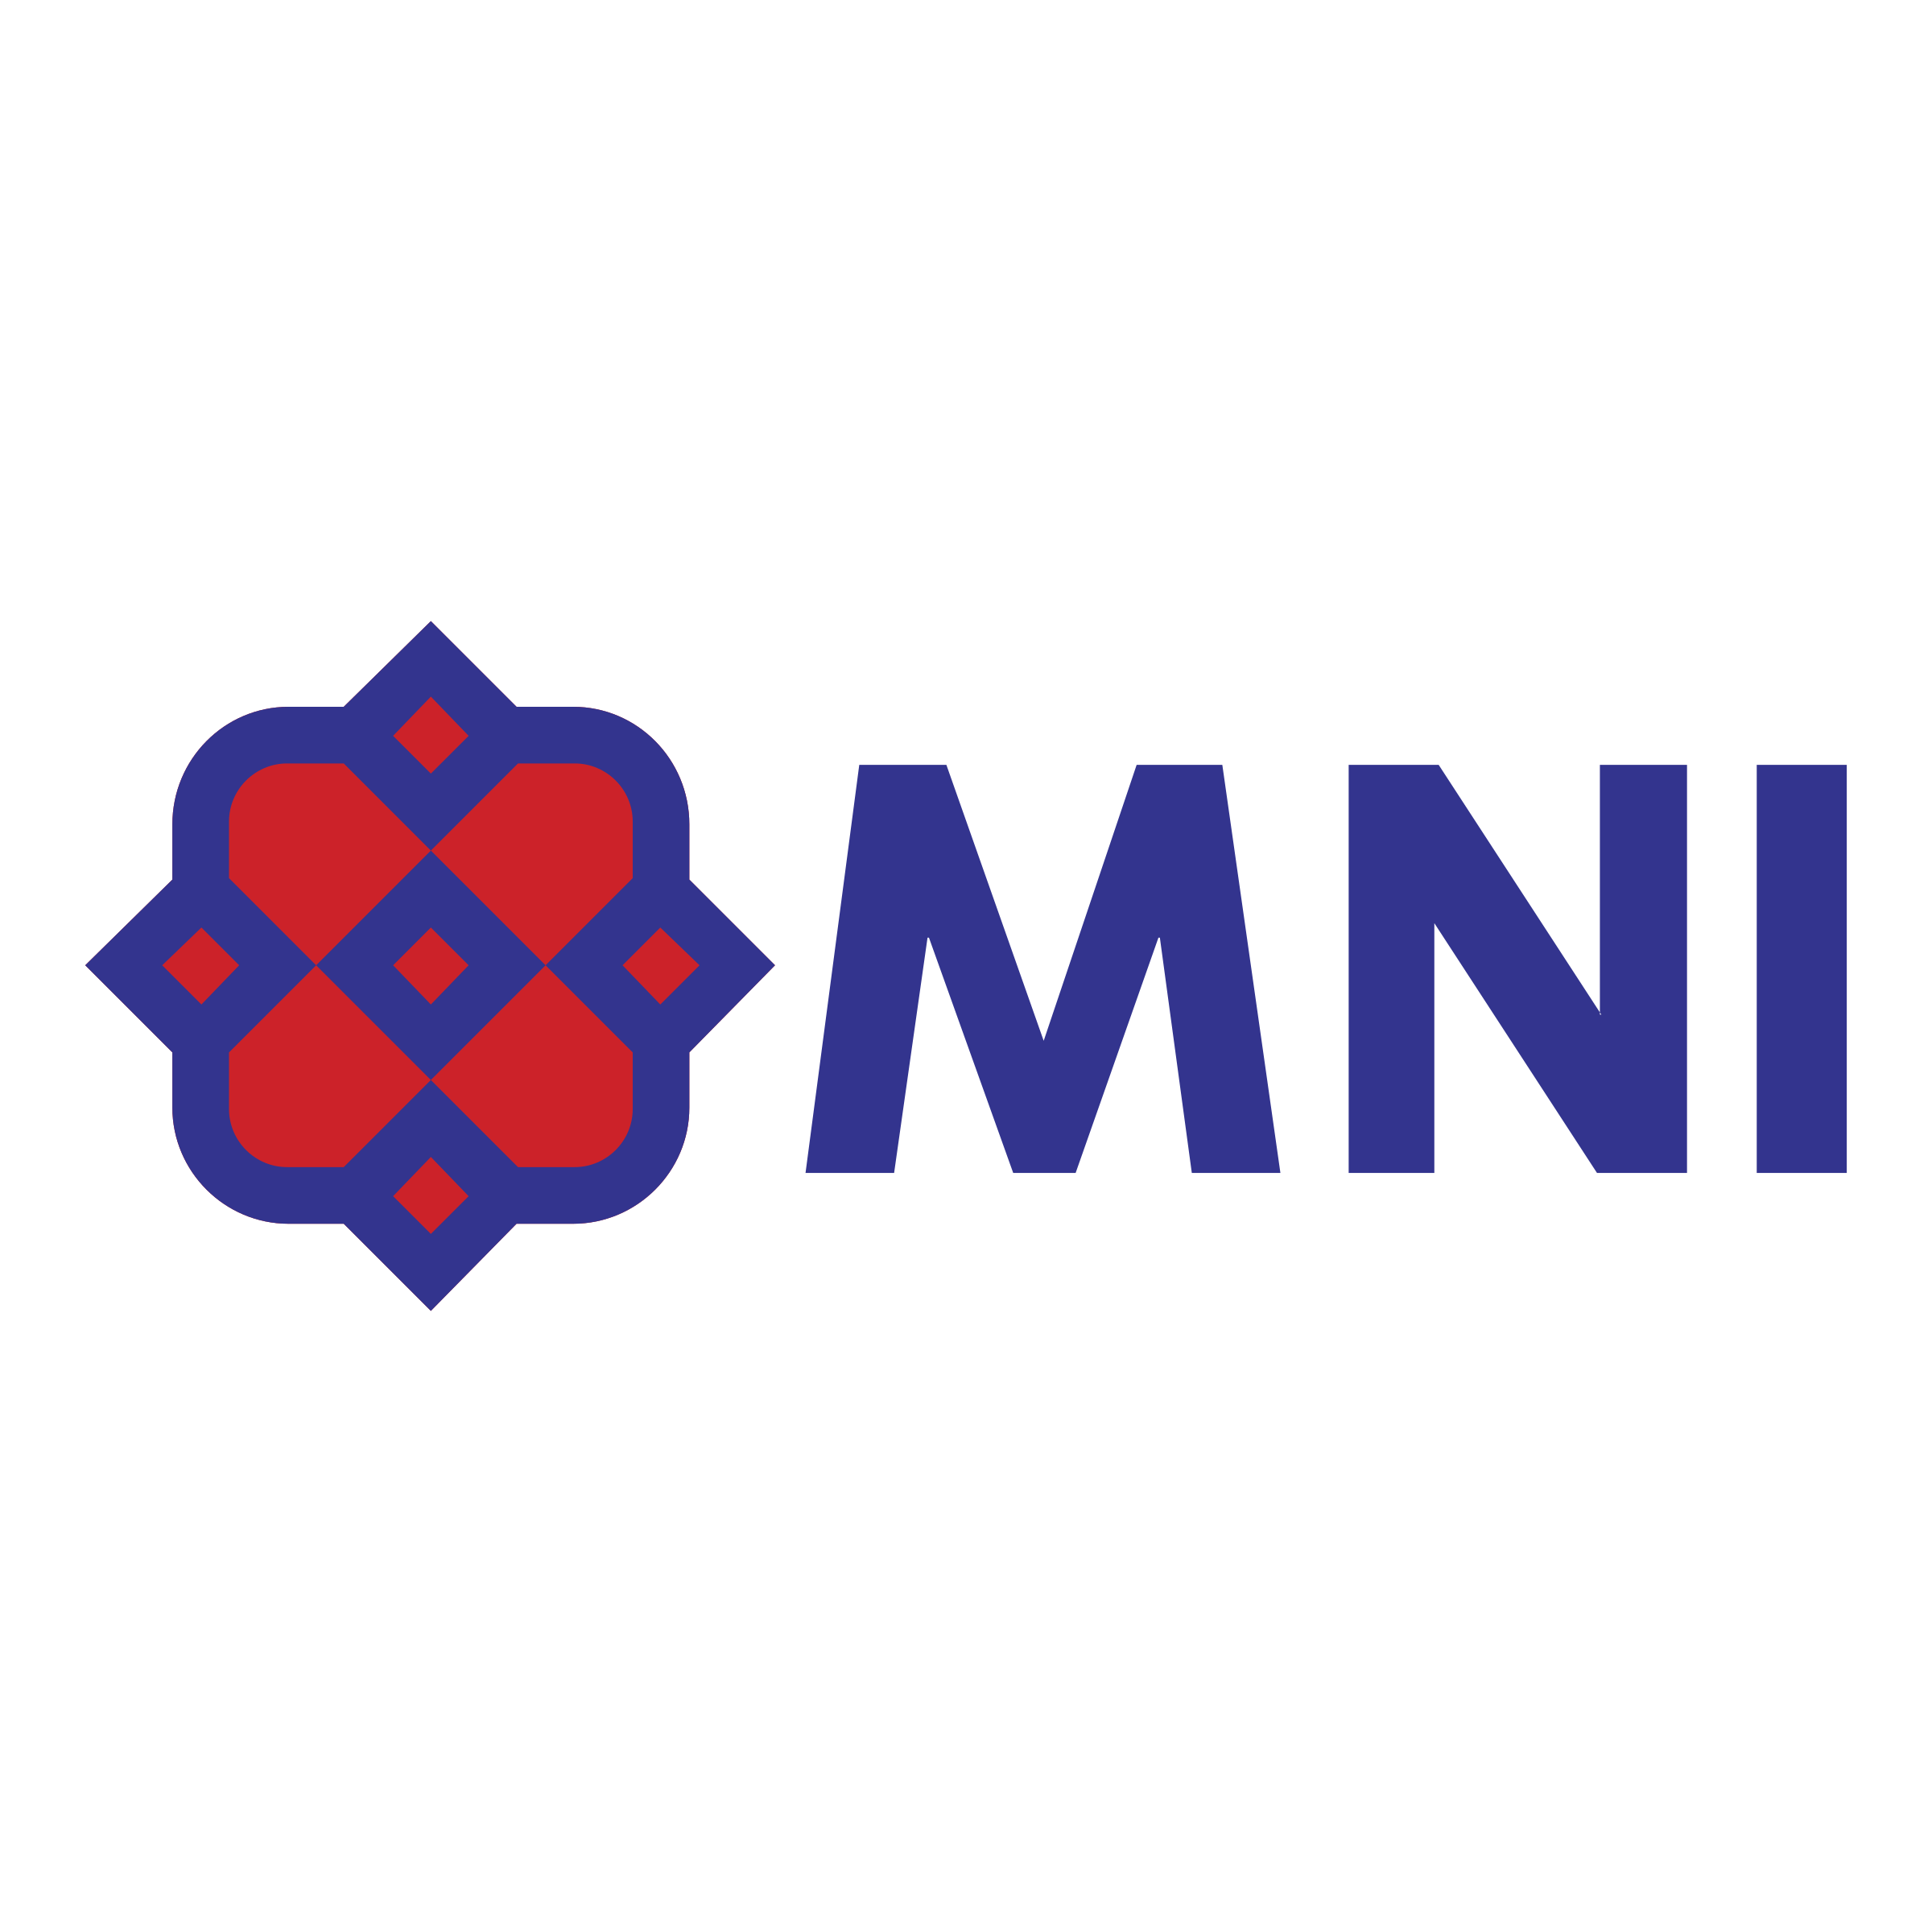 961780a8d24 MNI Logo PNG Transparent   SVG Vector - Freebie Supply